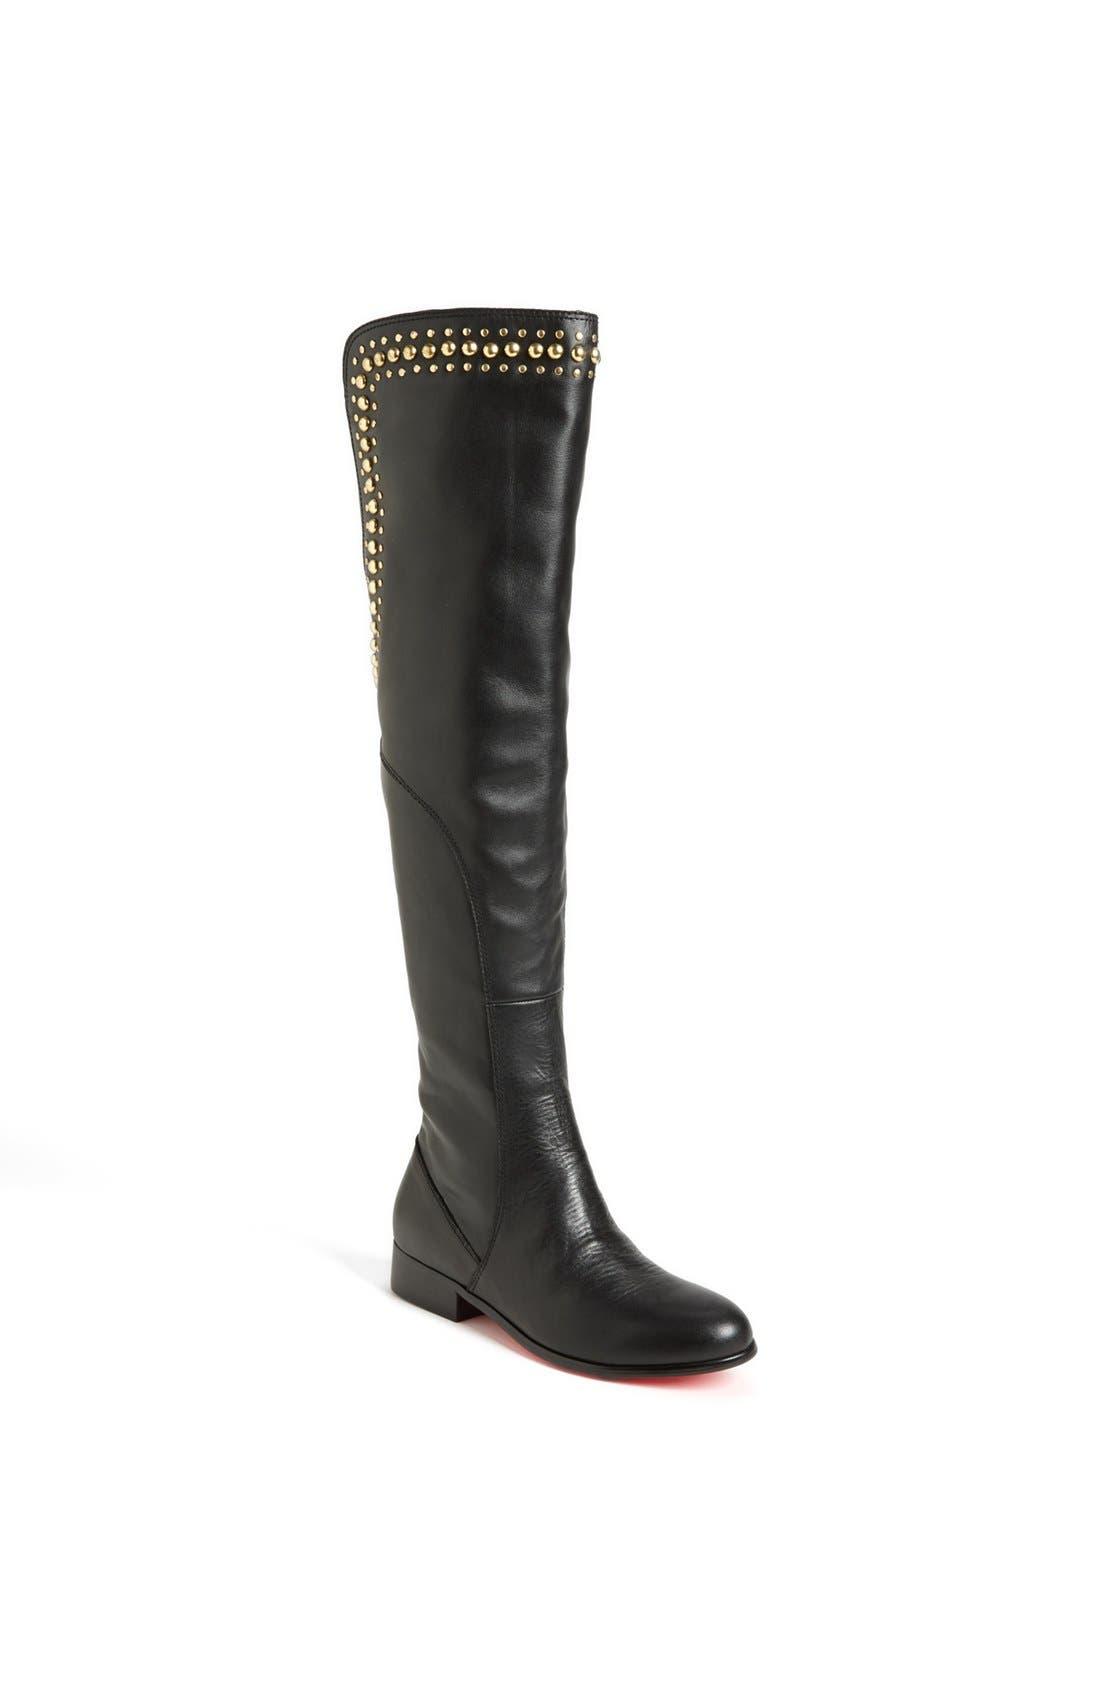 Main Image - Betsey Johnson 'Shanah' Over the Knee Boot